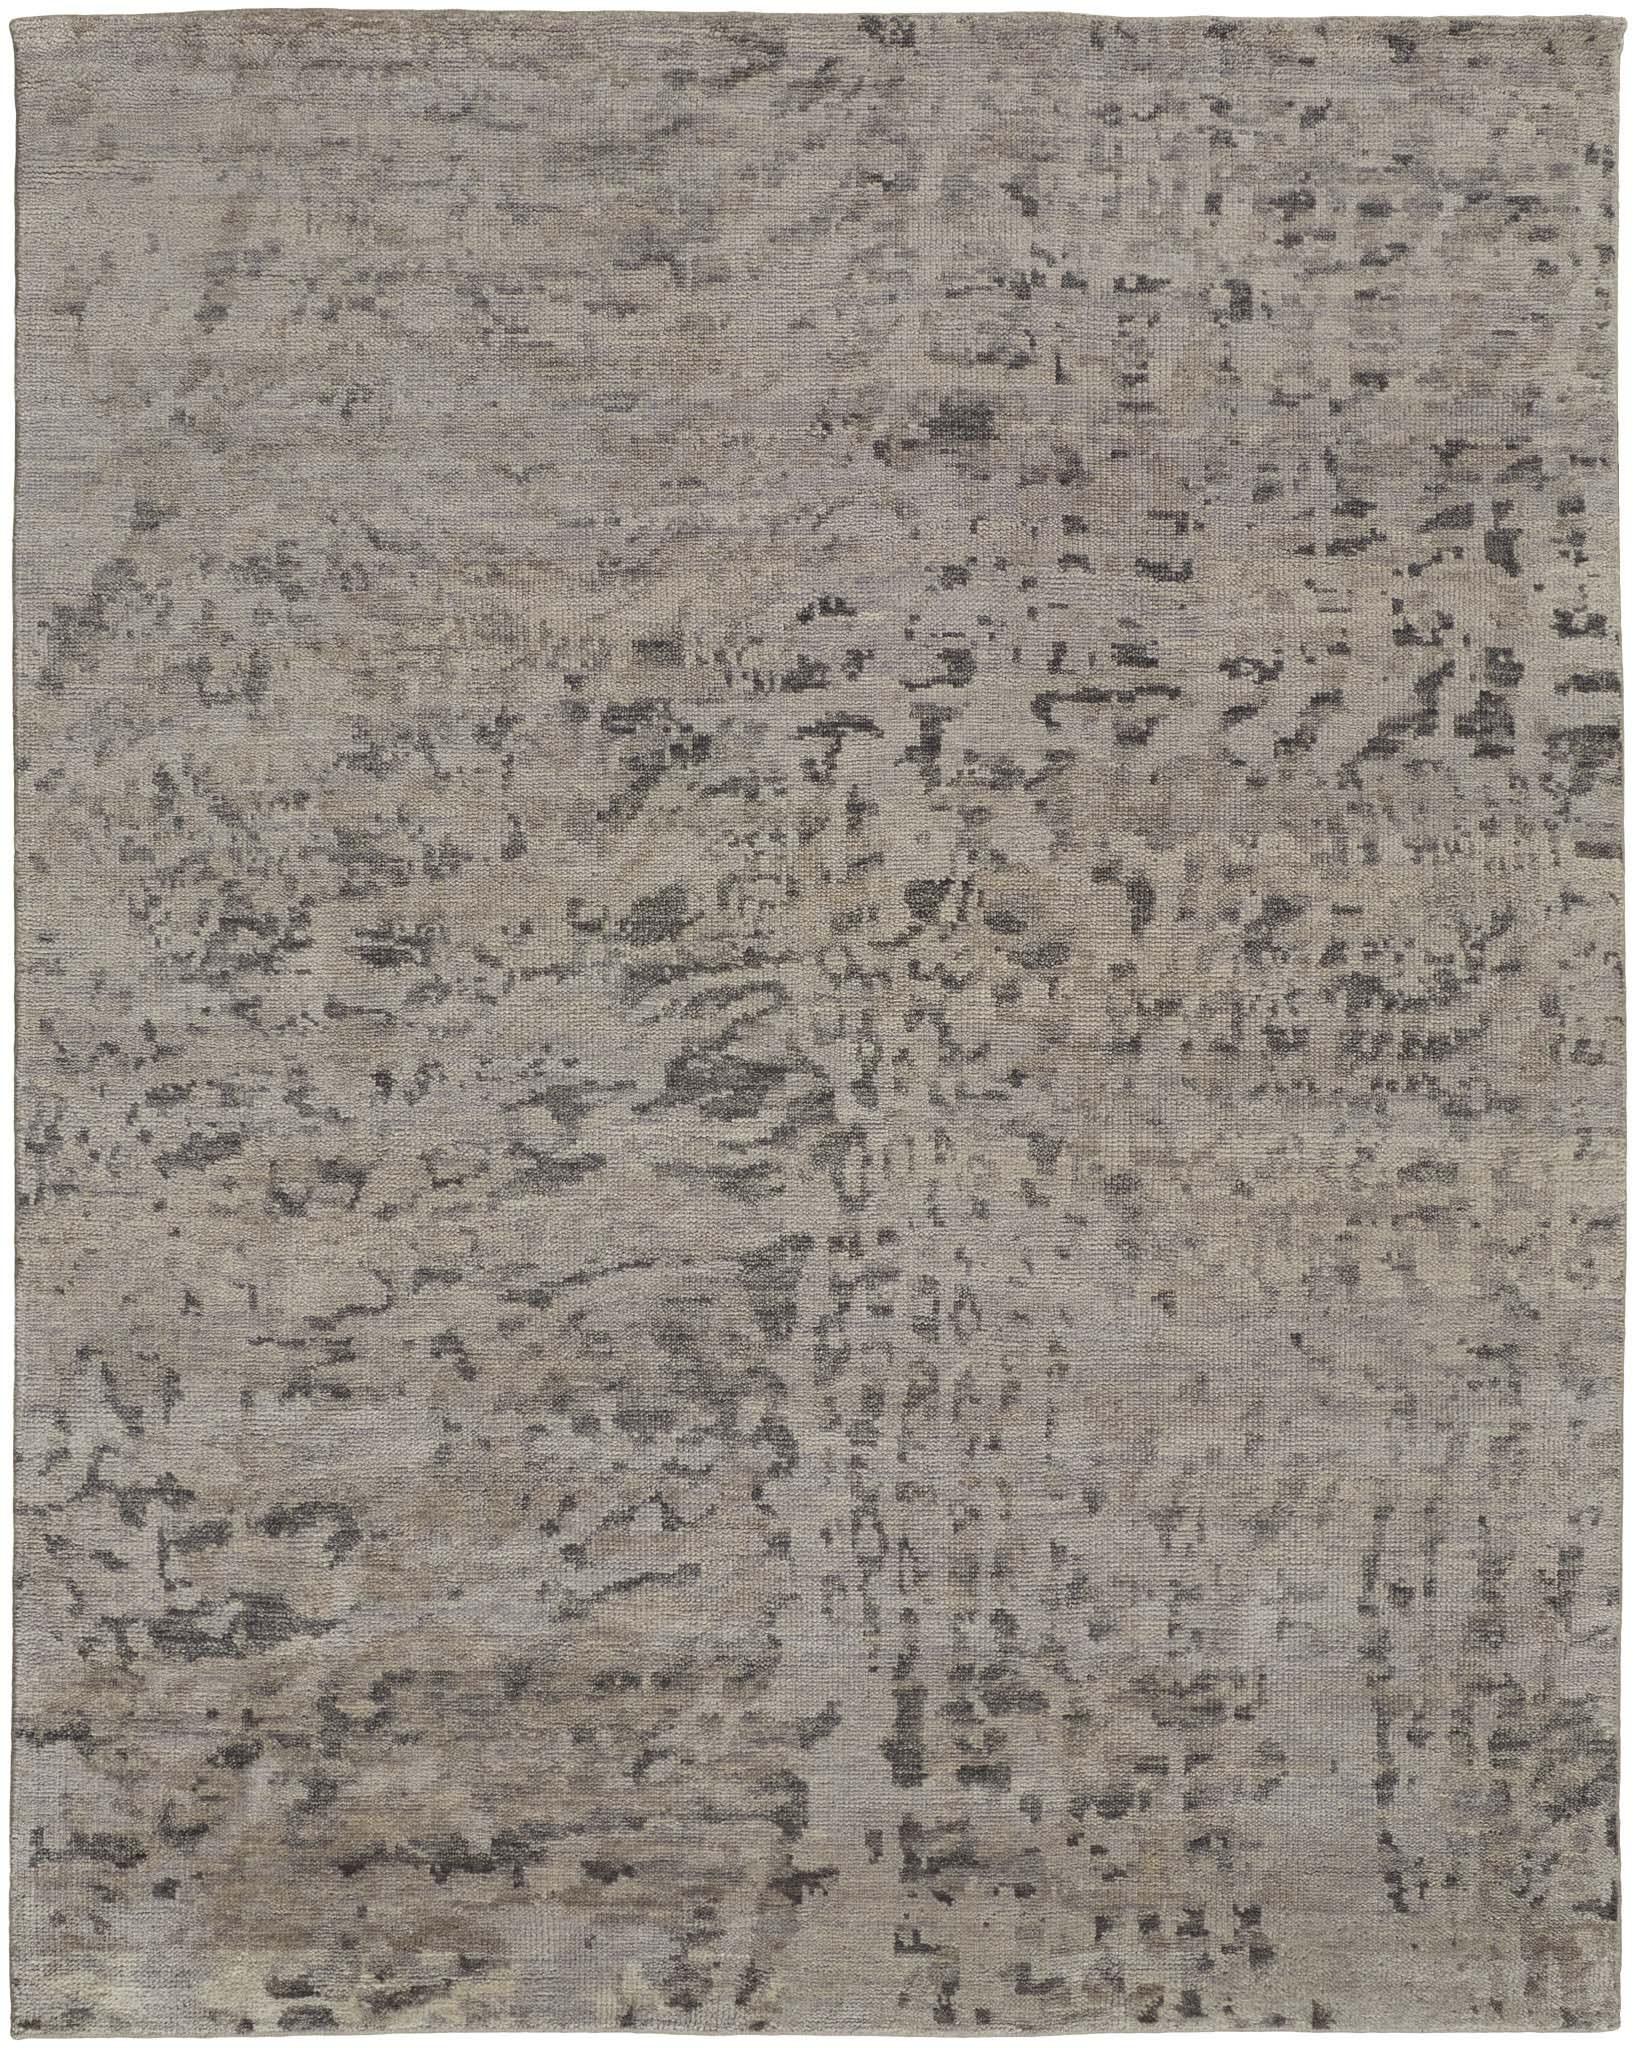 WYMAN T6002 Gray